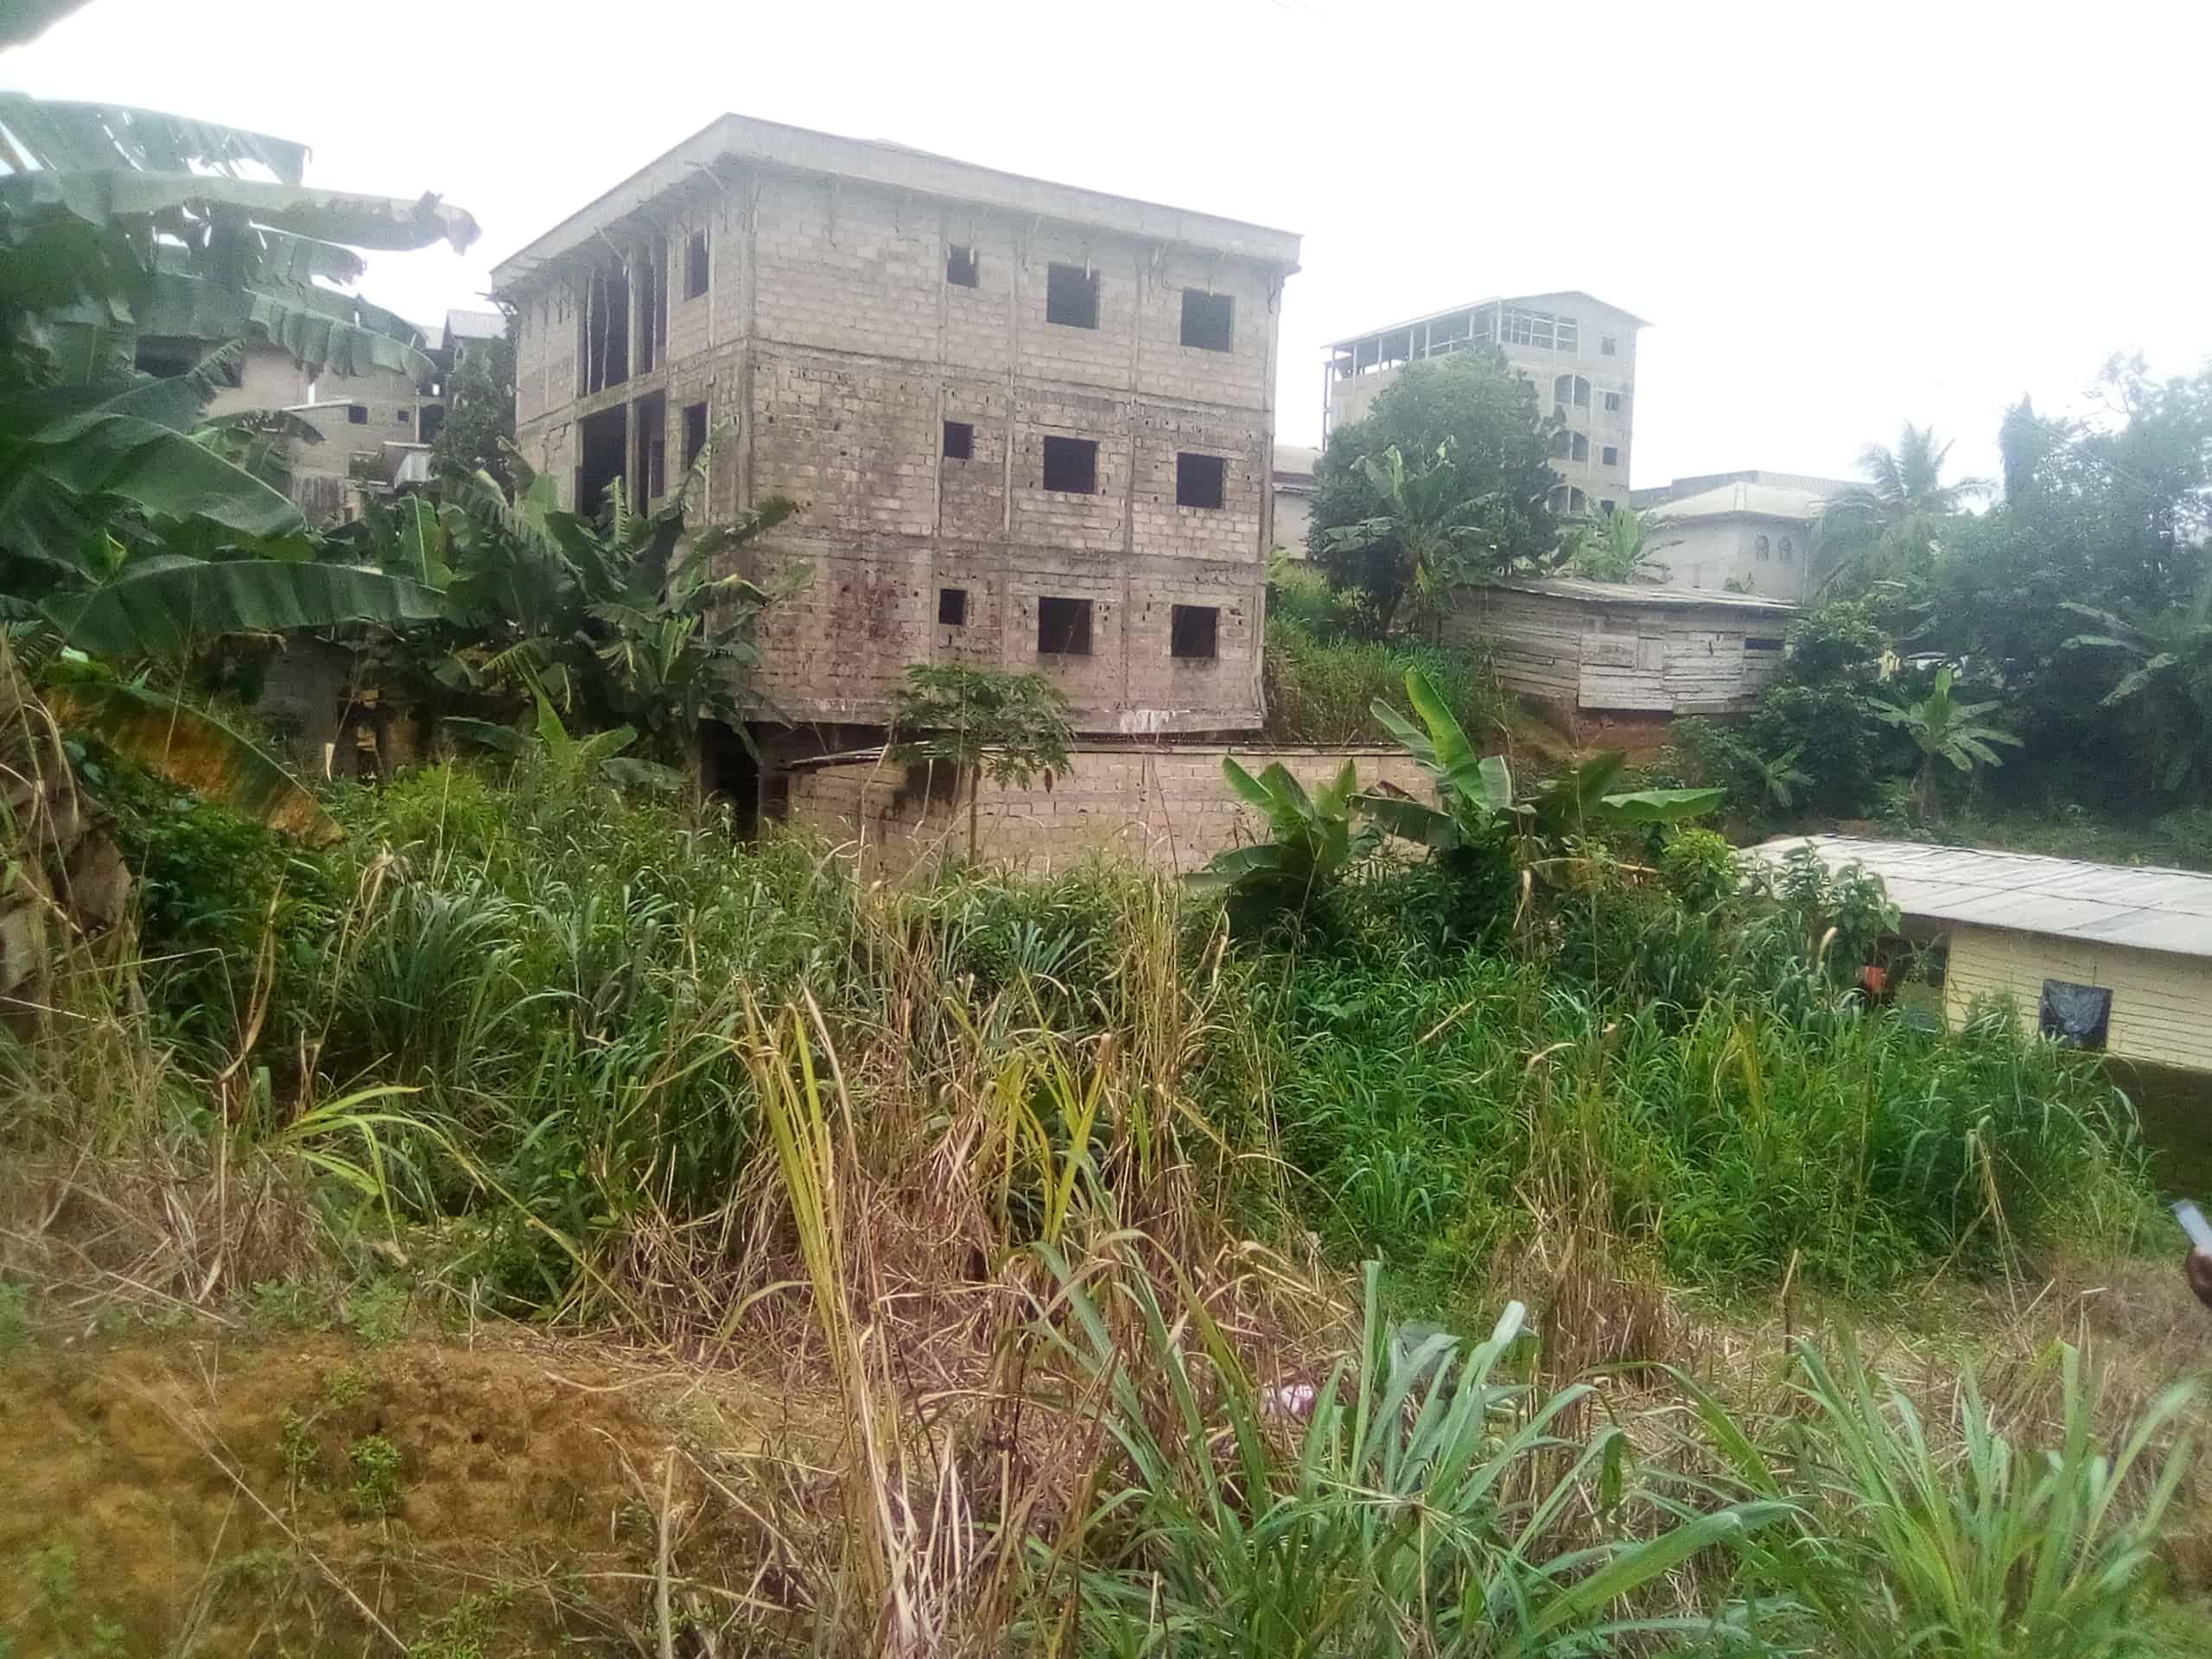 Terrain à vendre - Douala, Logpom, Avant l'hôpital des soeurs - 180 m2 - 7 000 000 FCFA